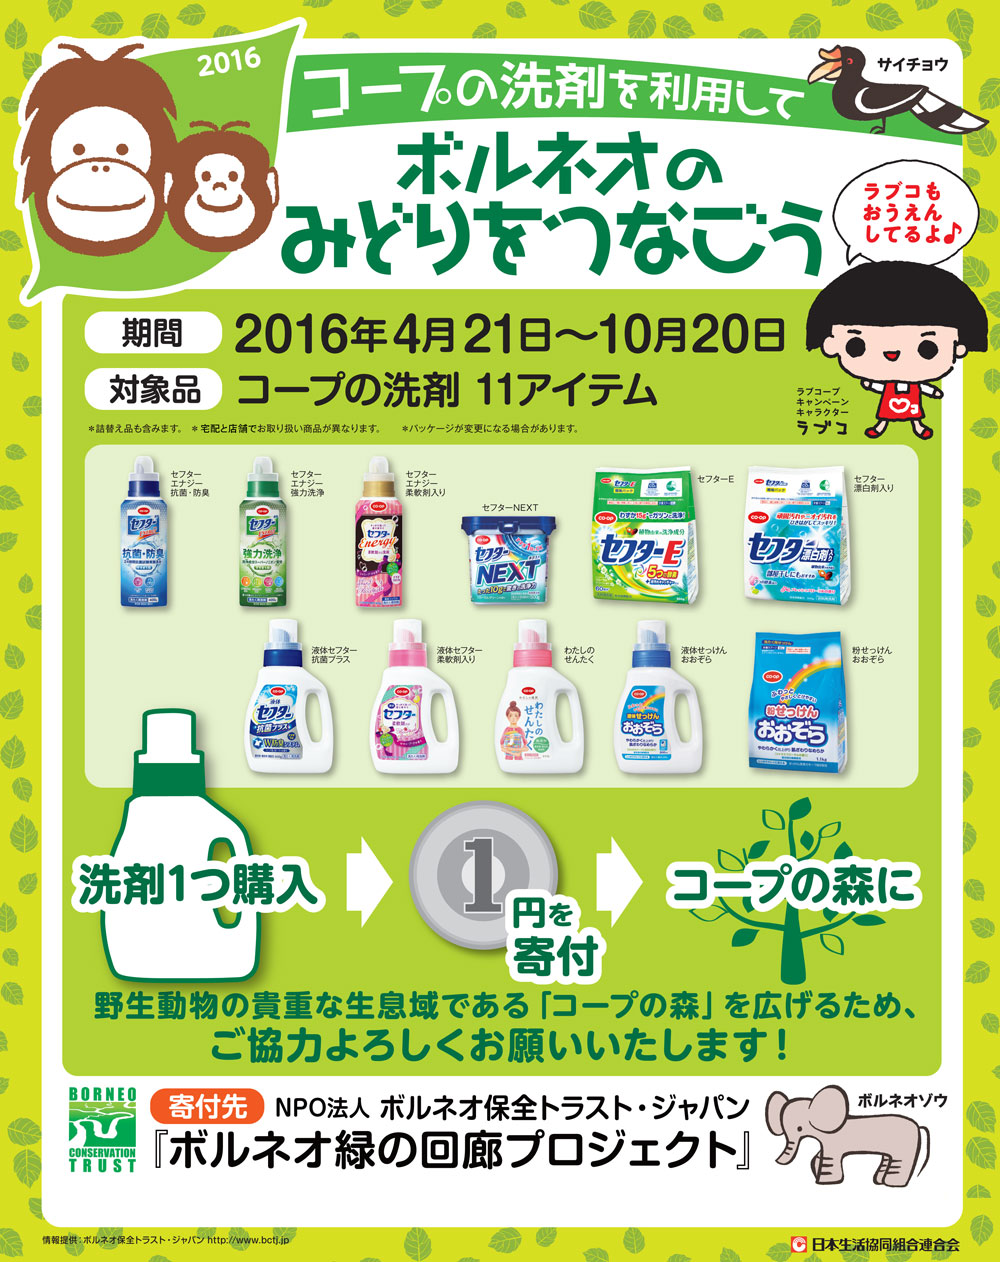 https://www.ucoop.or.jp/csr/environment/files/160428_2016borneo.jpg